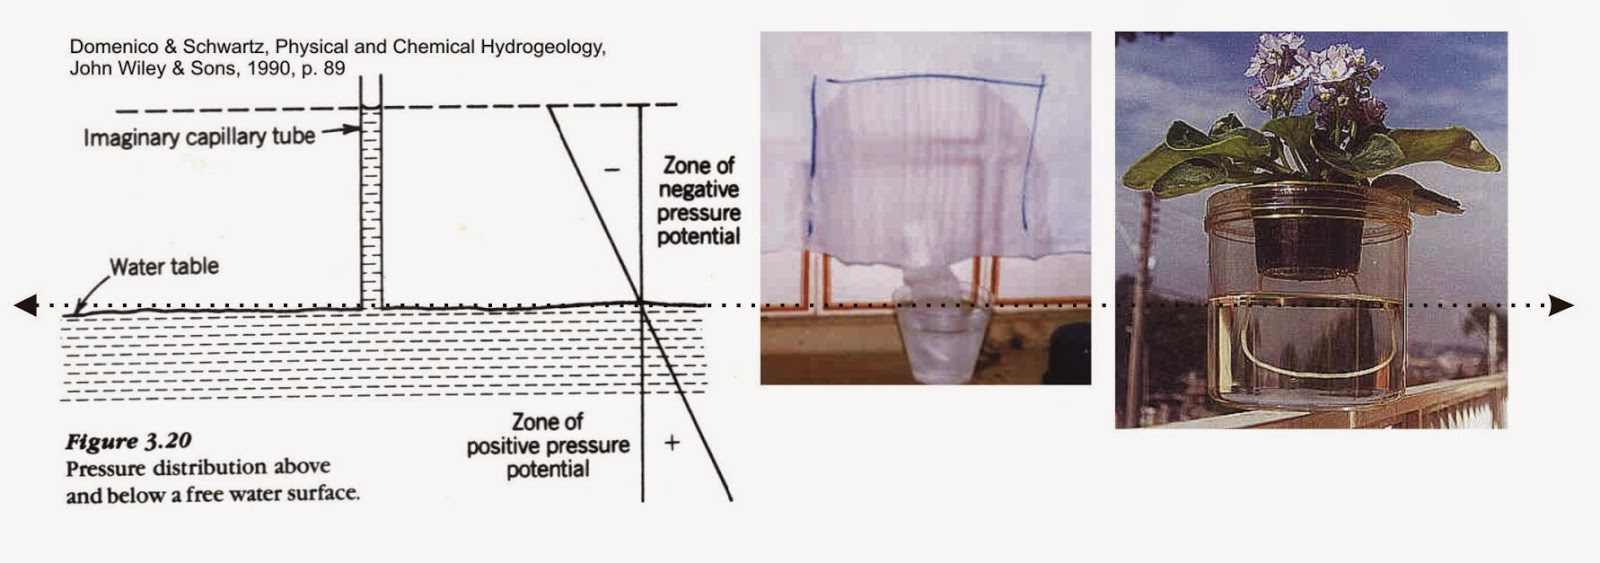 HYDROTECHNOLOGY - A New Science | Injetor de Resíduos Orgânicos ...